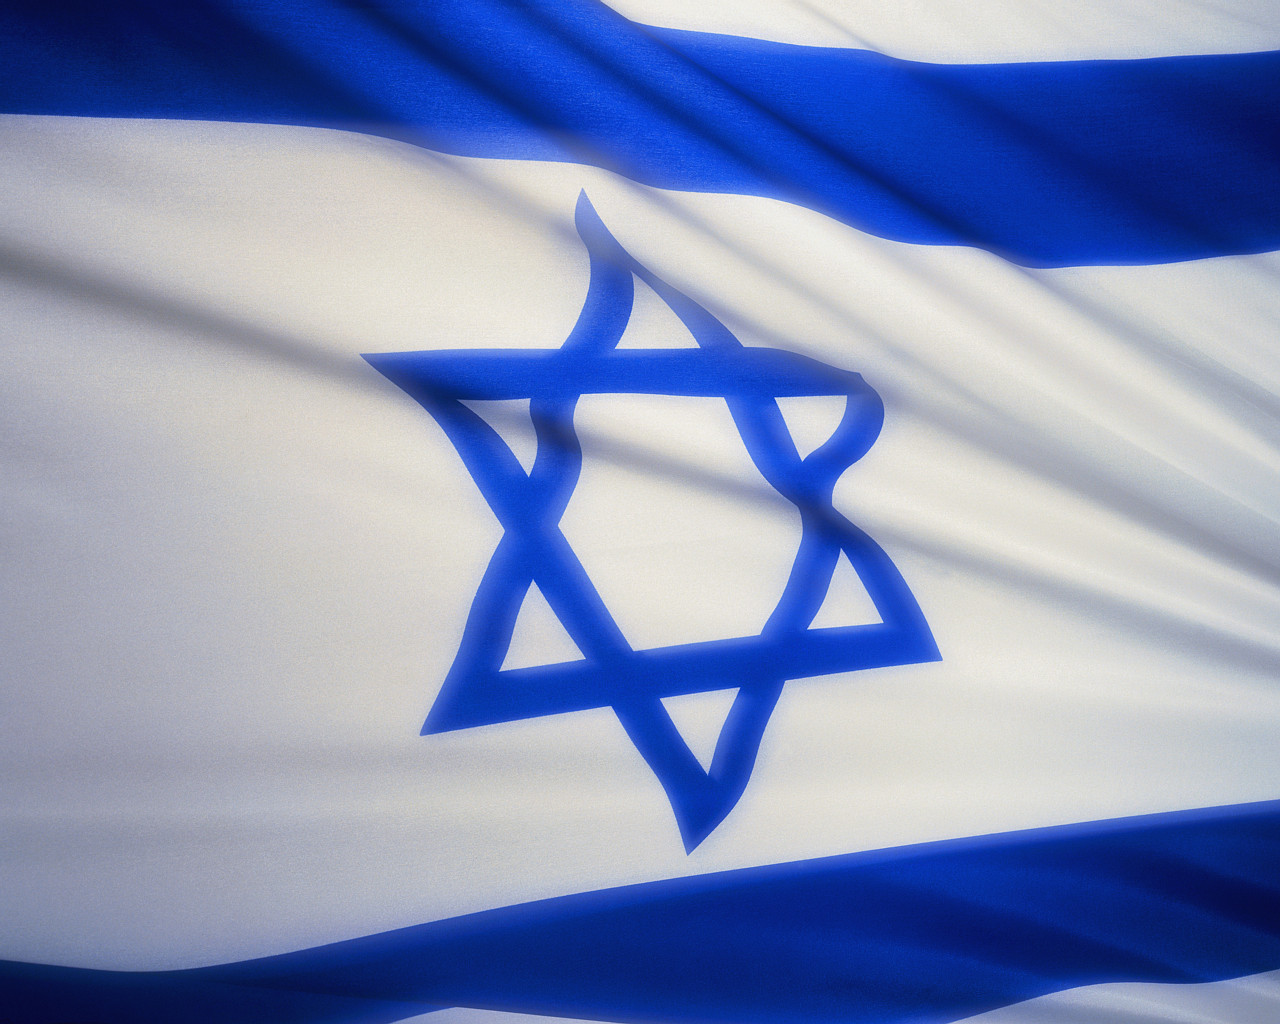 http://3.bp.blogspot.com/-jPbUya77nFk/TapGoJqGZxI/AAAAAAAAAI8/R68K5rR_gRE/s1600/israel_flag.jpg